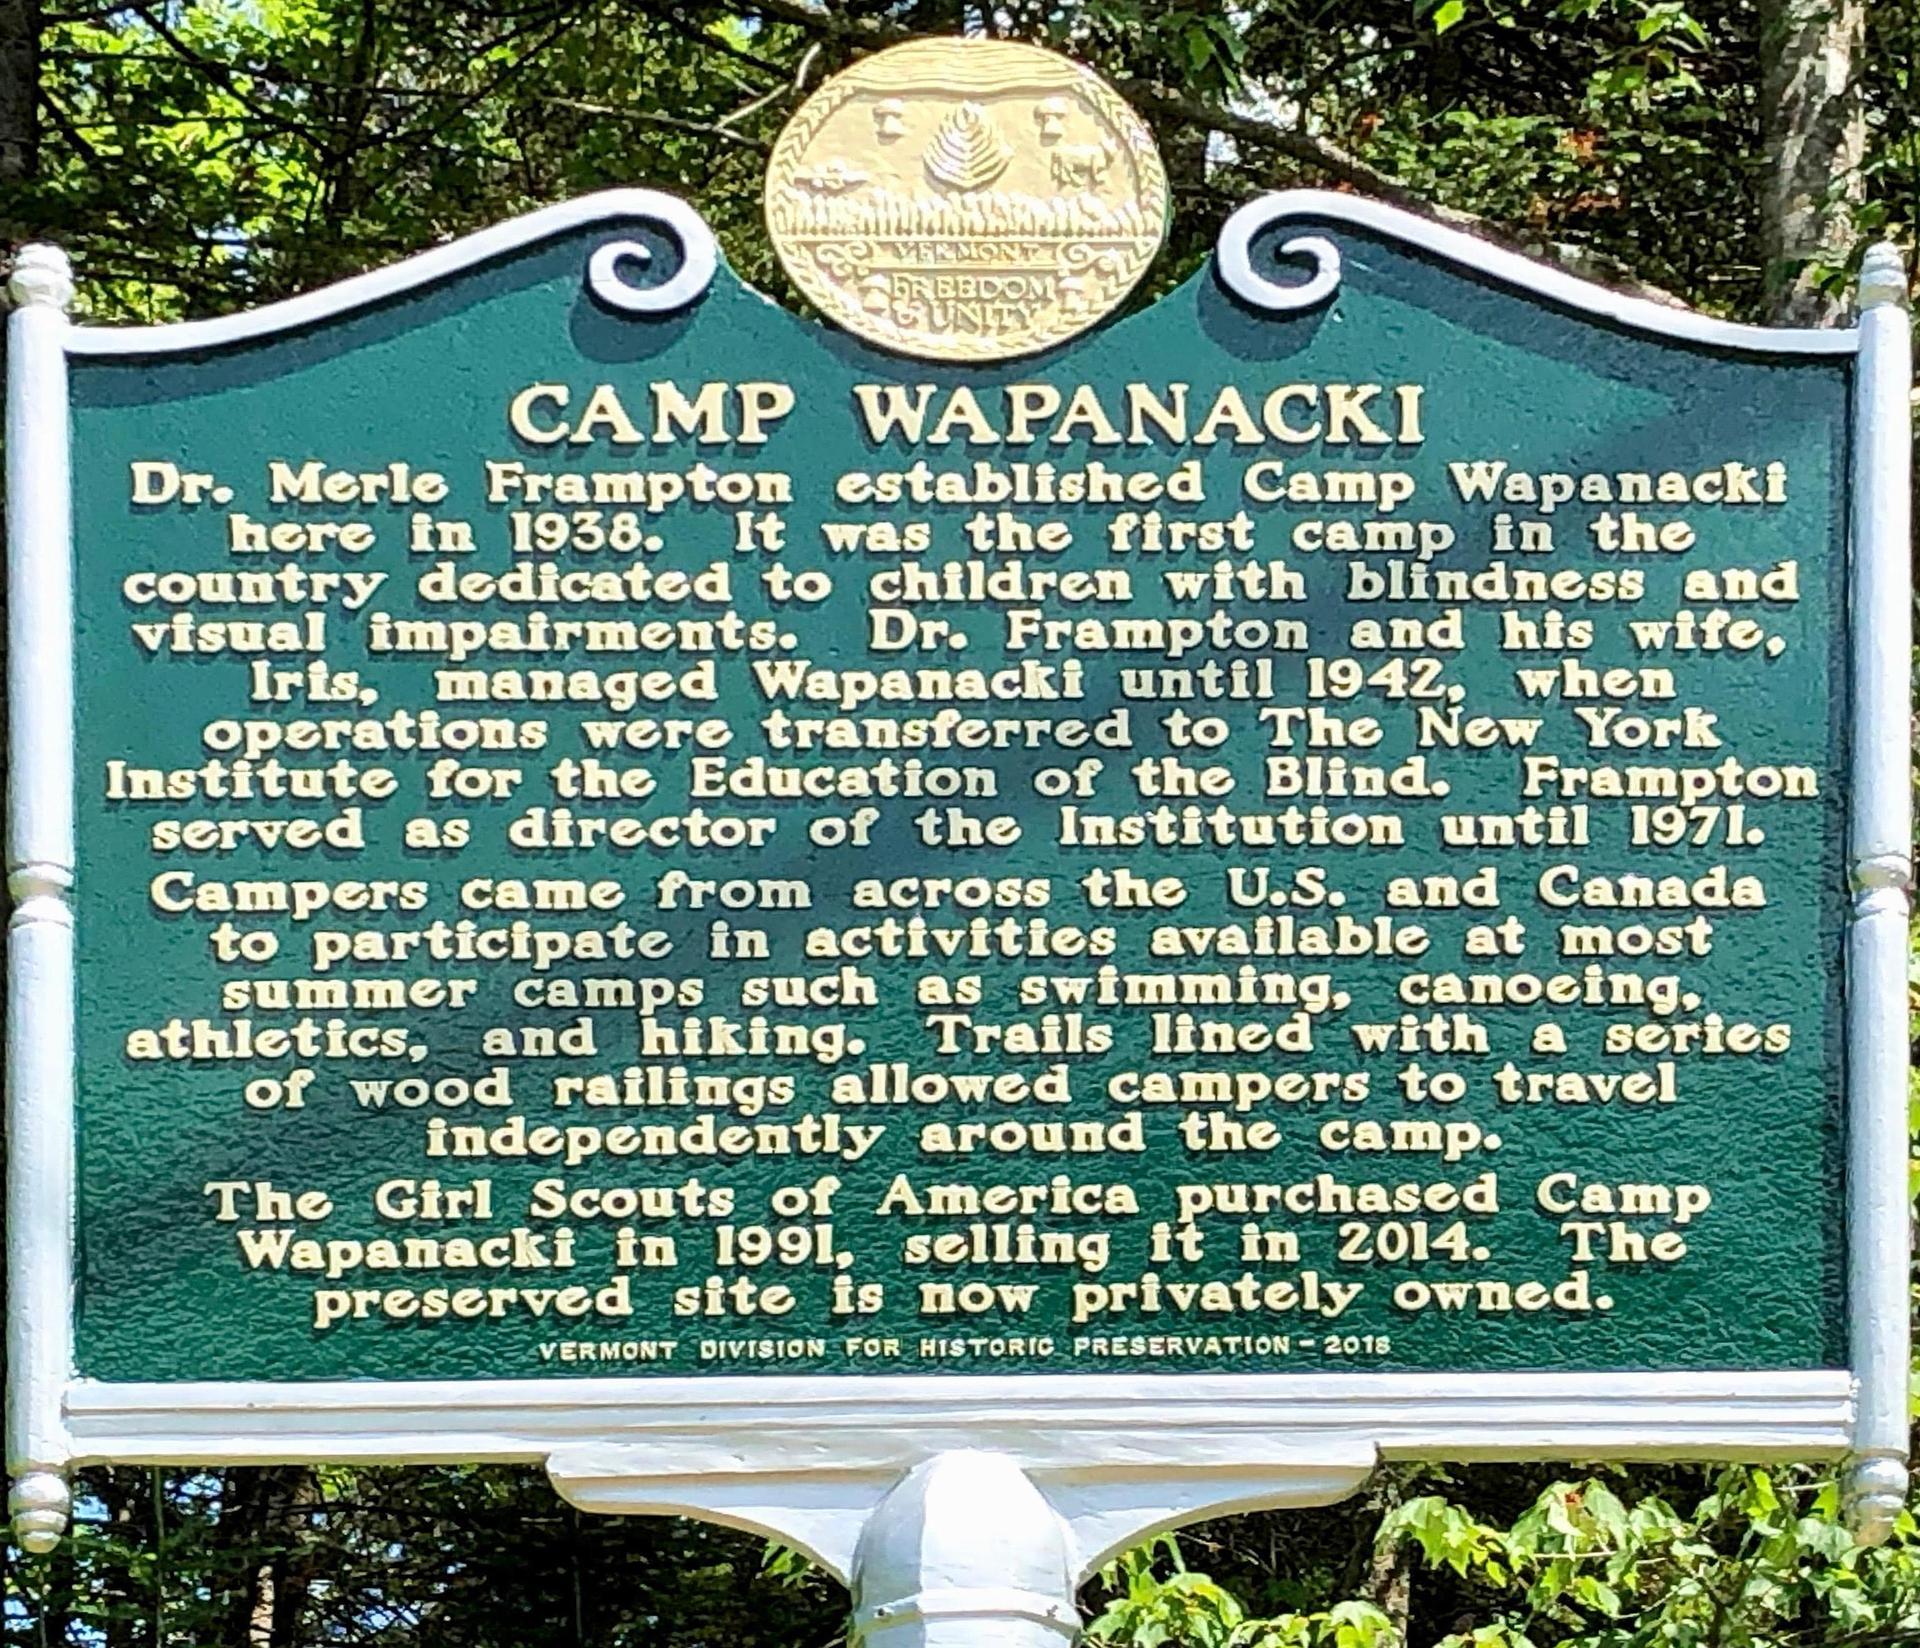 Historical marker of Camp Wapanacki